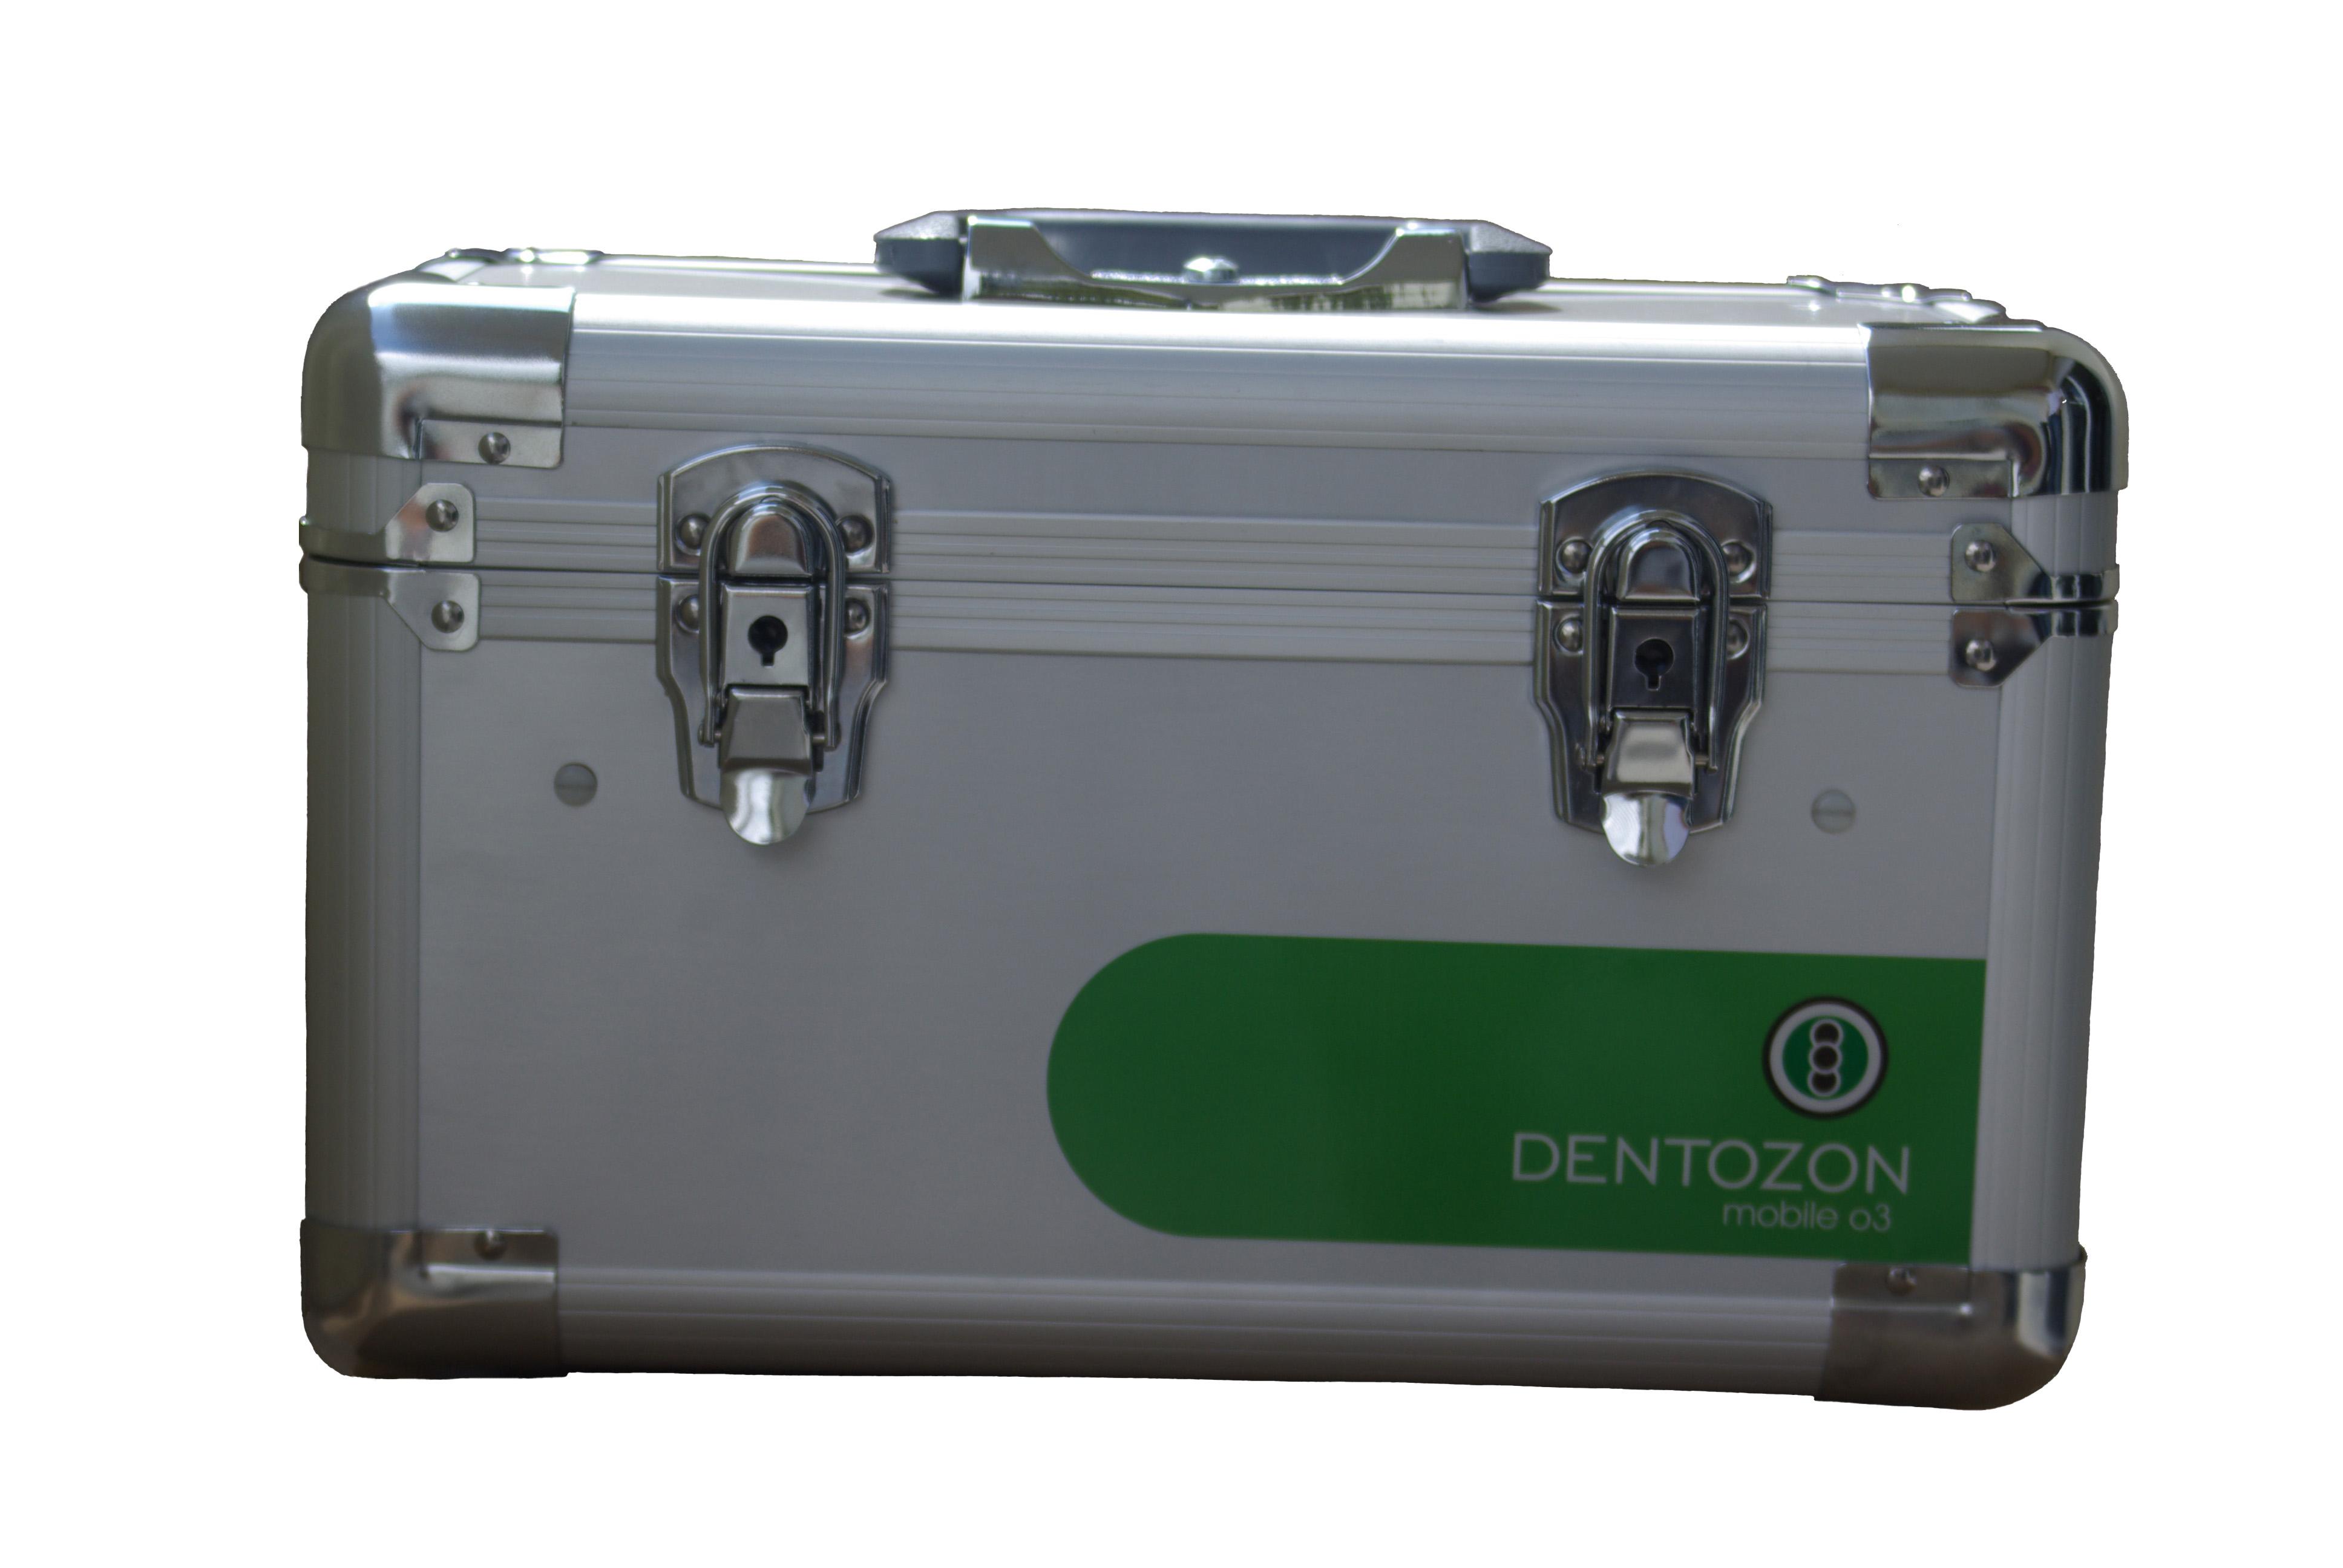 Dentozon mobile o3 chitodent-vertrieb.de